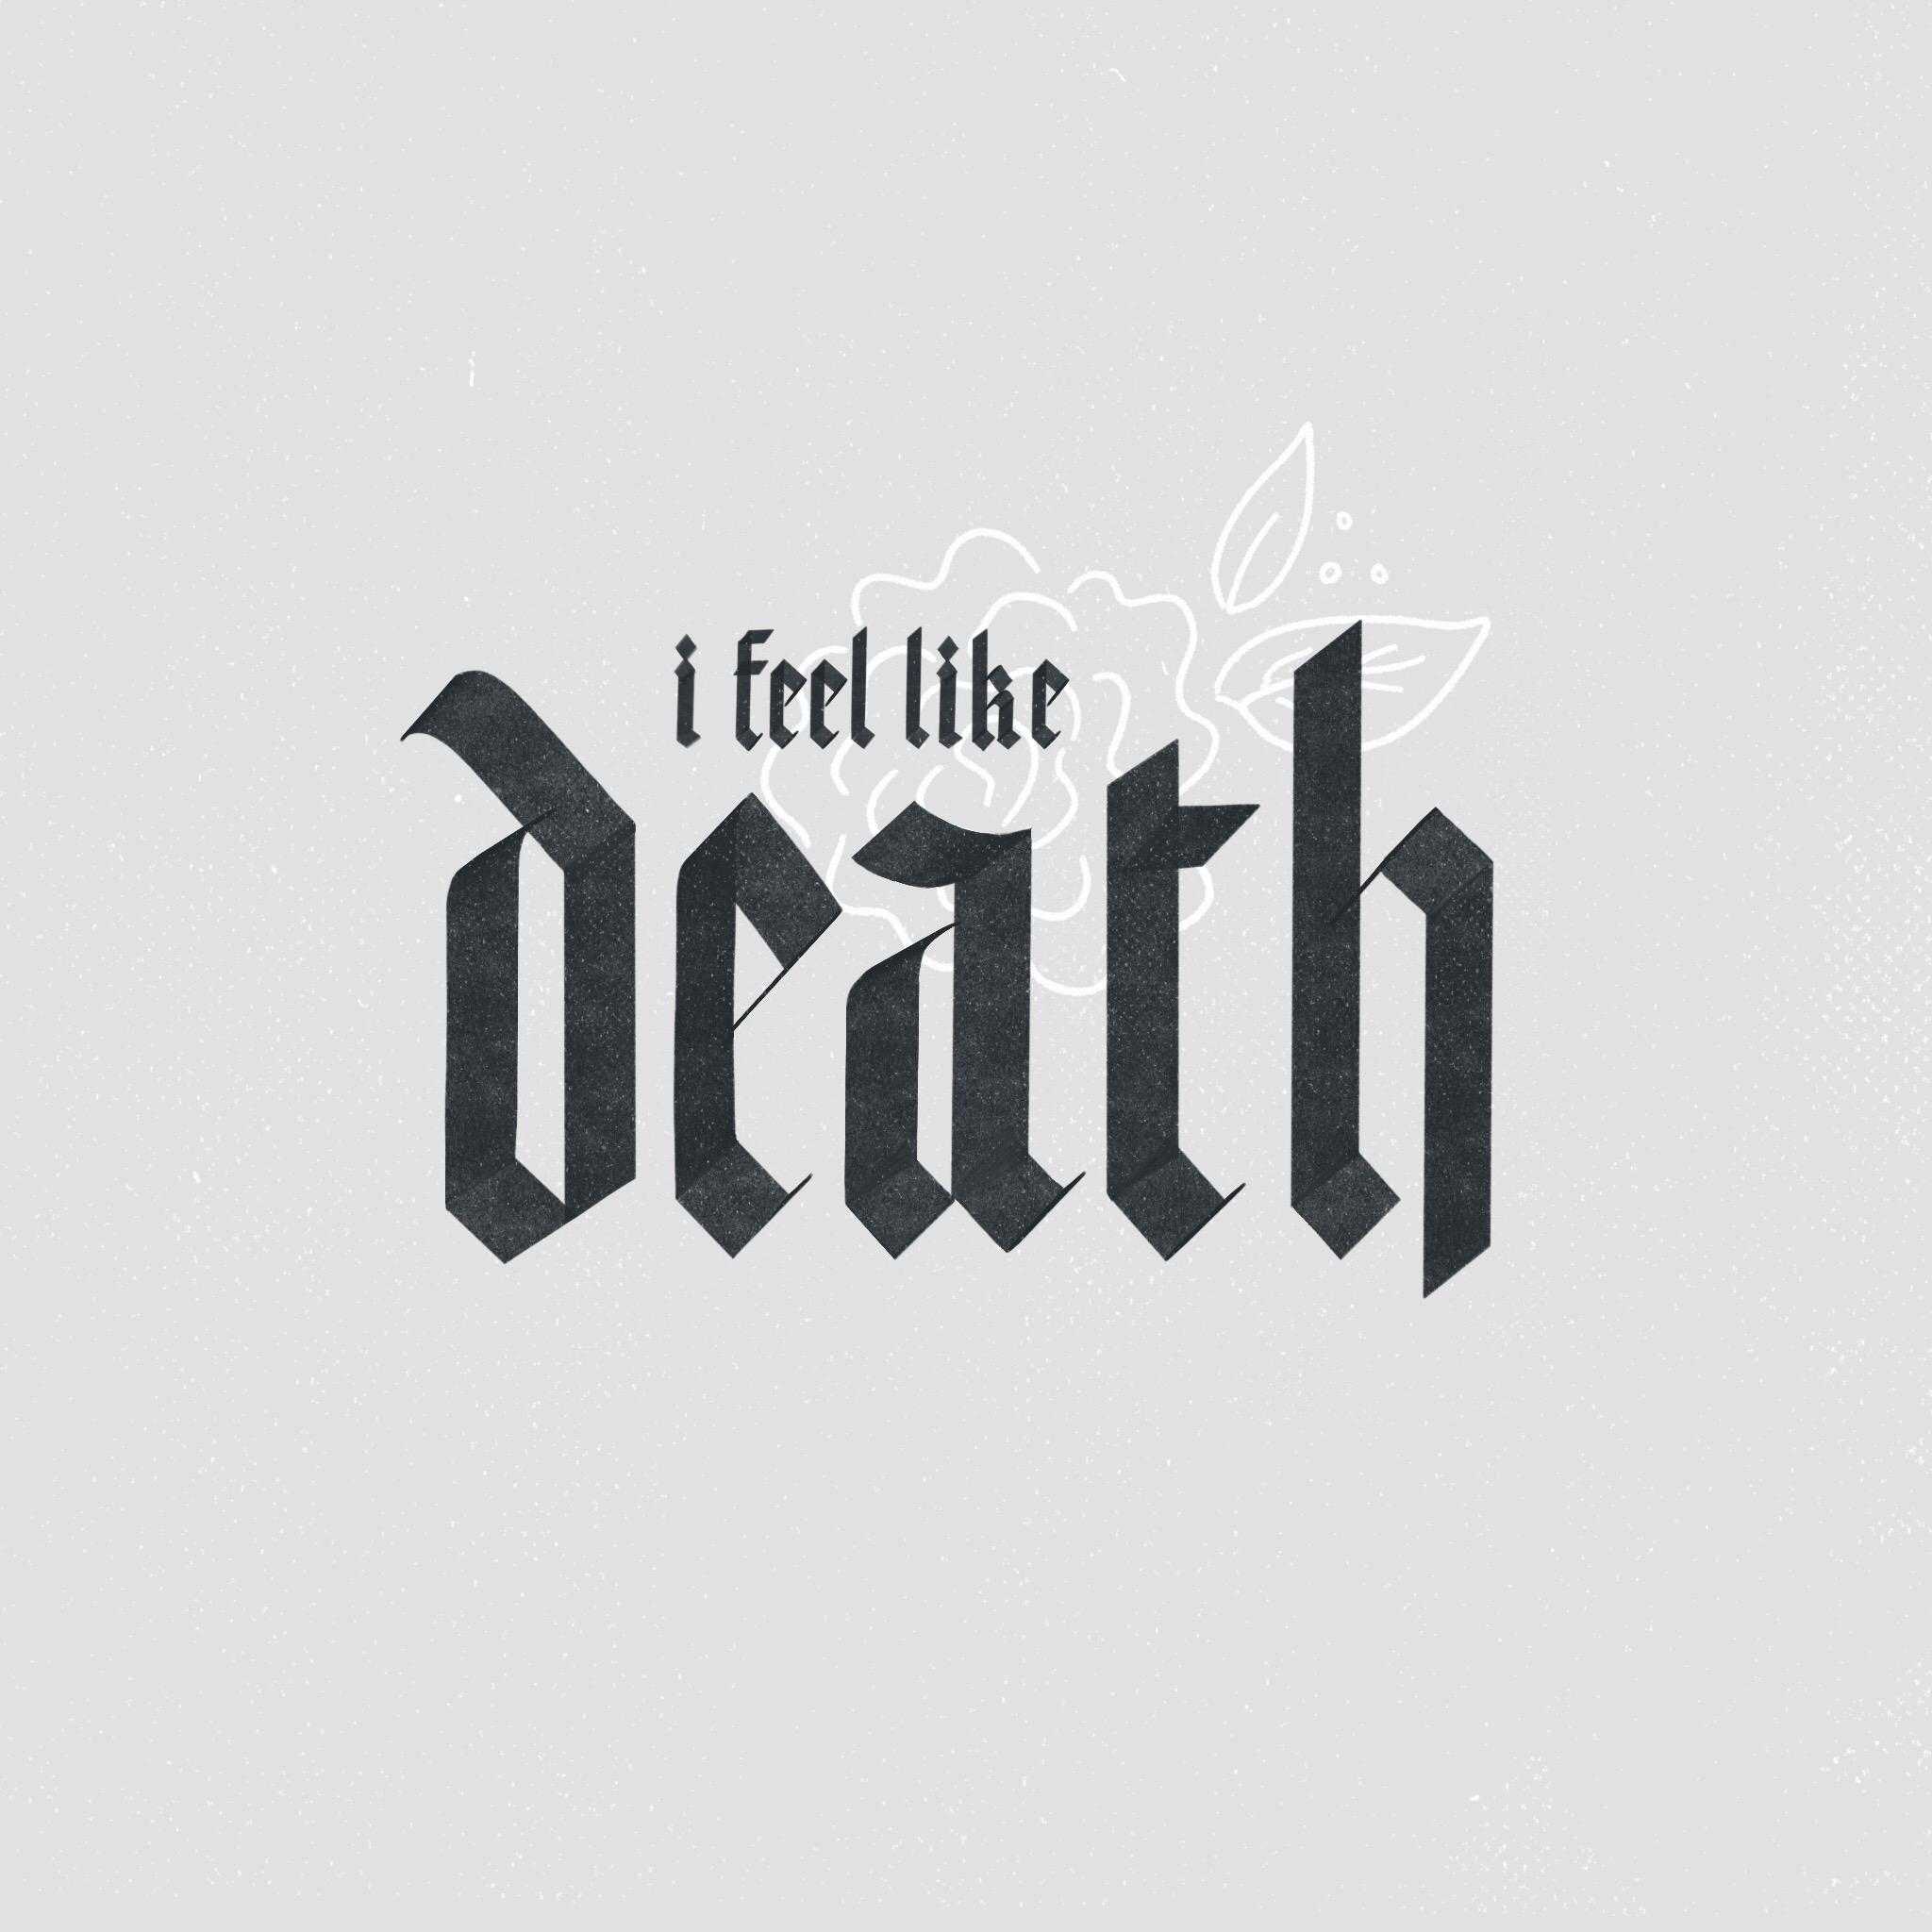 death-2.jpg